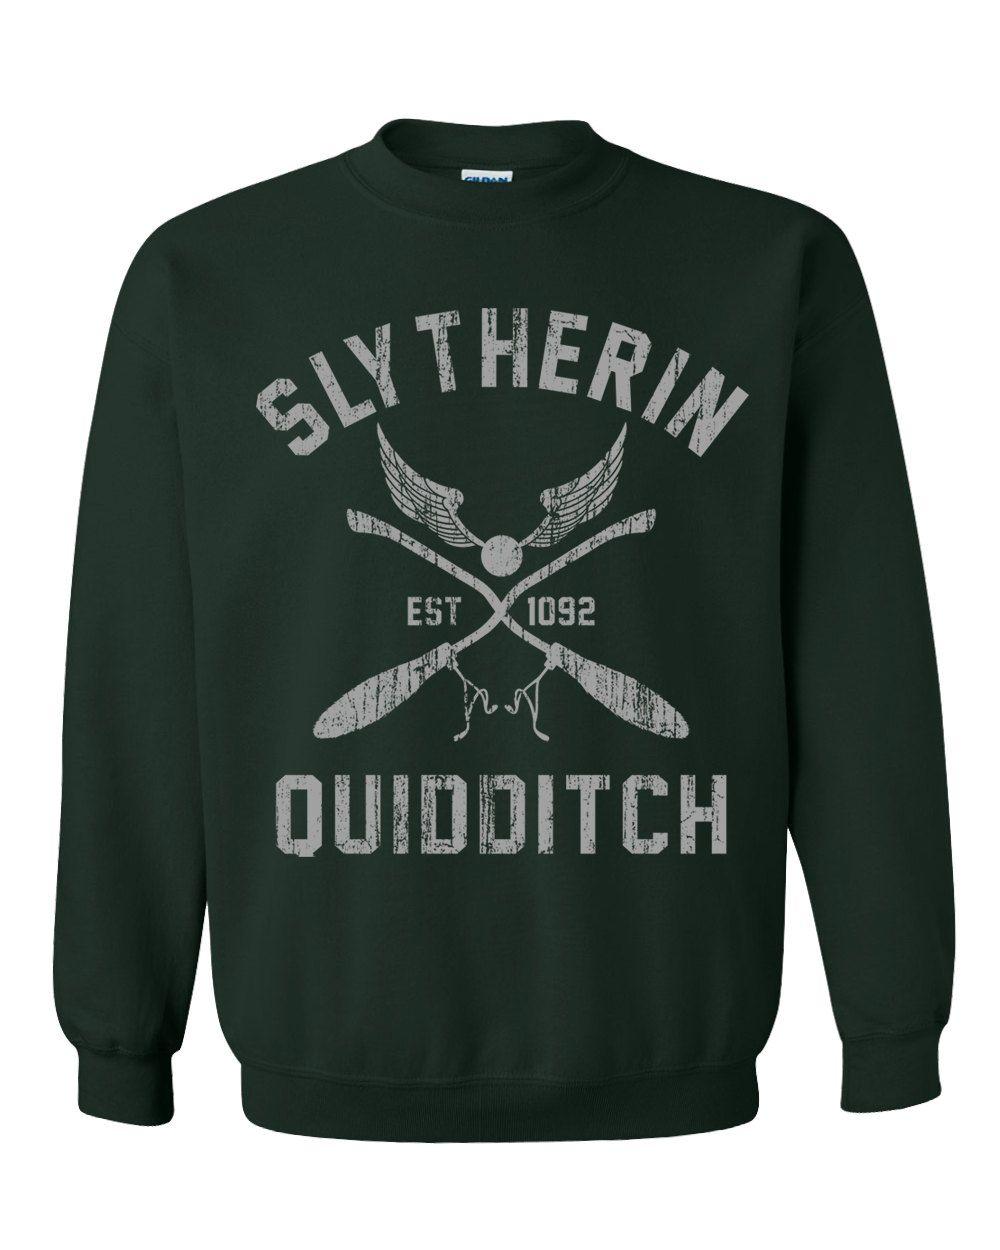 Slytherin Sweatshirt Harry Potter Sweatshirt Slytherin T Shirt Harry Pottter T Shirt Quidditch Shirt Ravencl Sweatshirts Quidditch Shirt Crew Neck Sweatshirt [ 1250 x 1000 Pixel ]